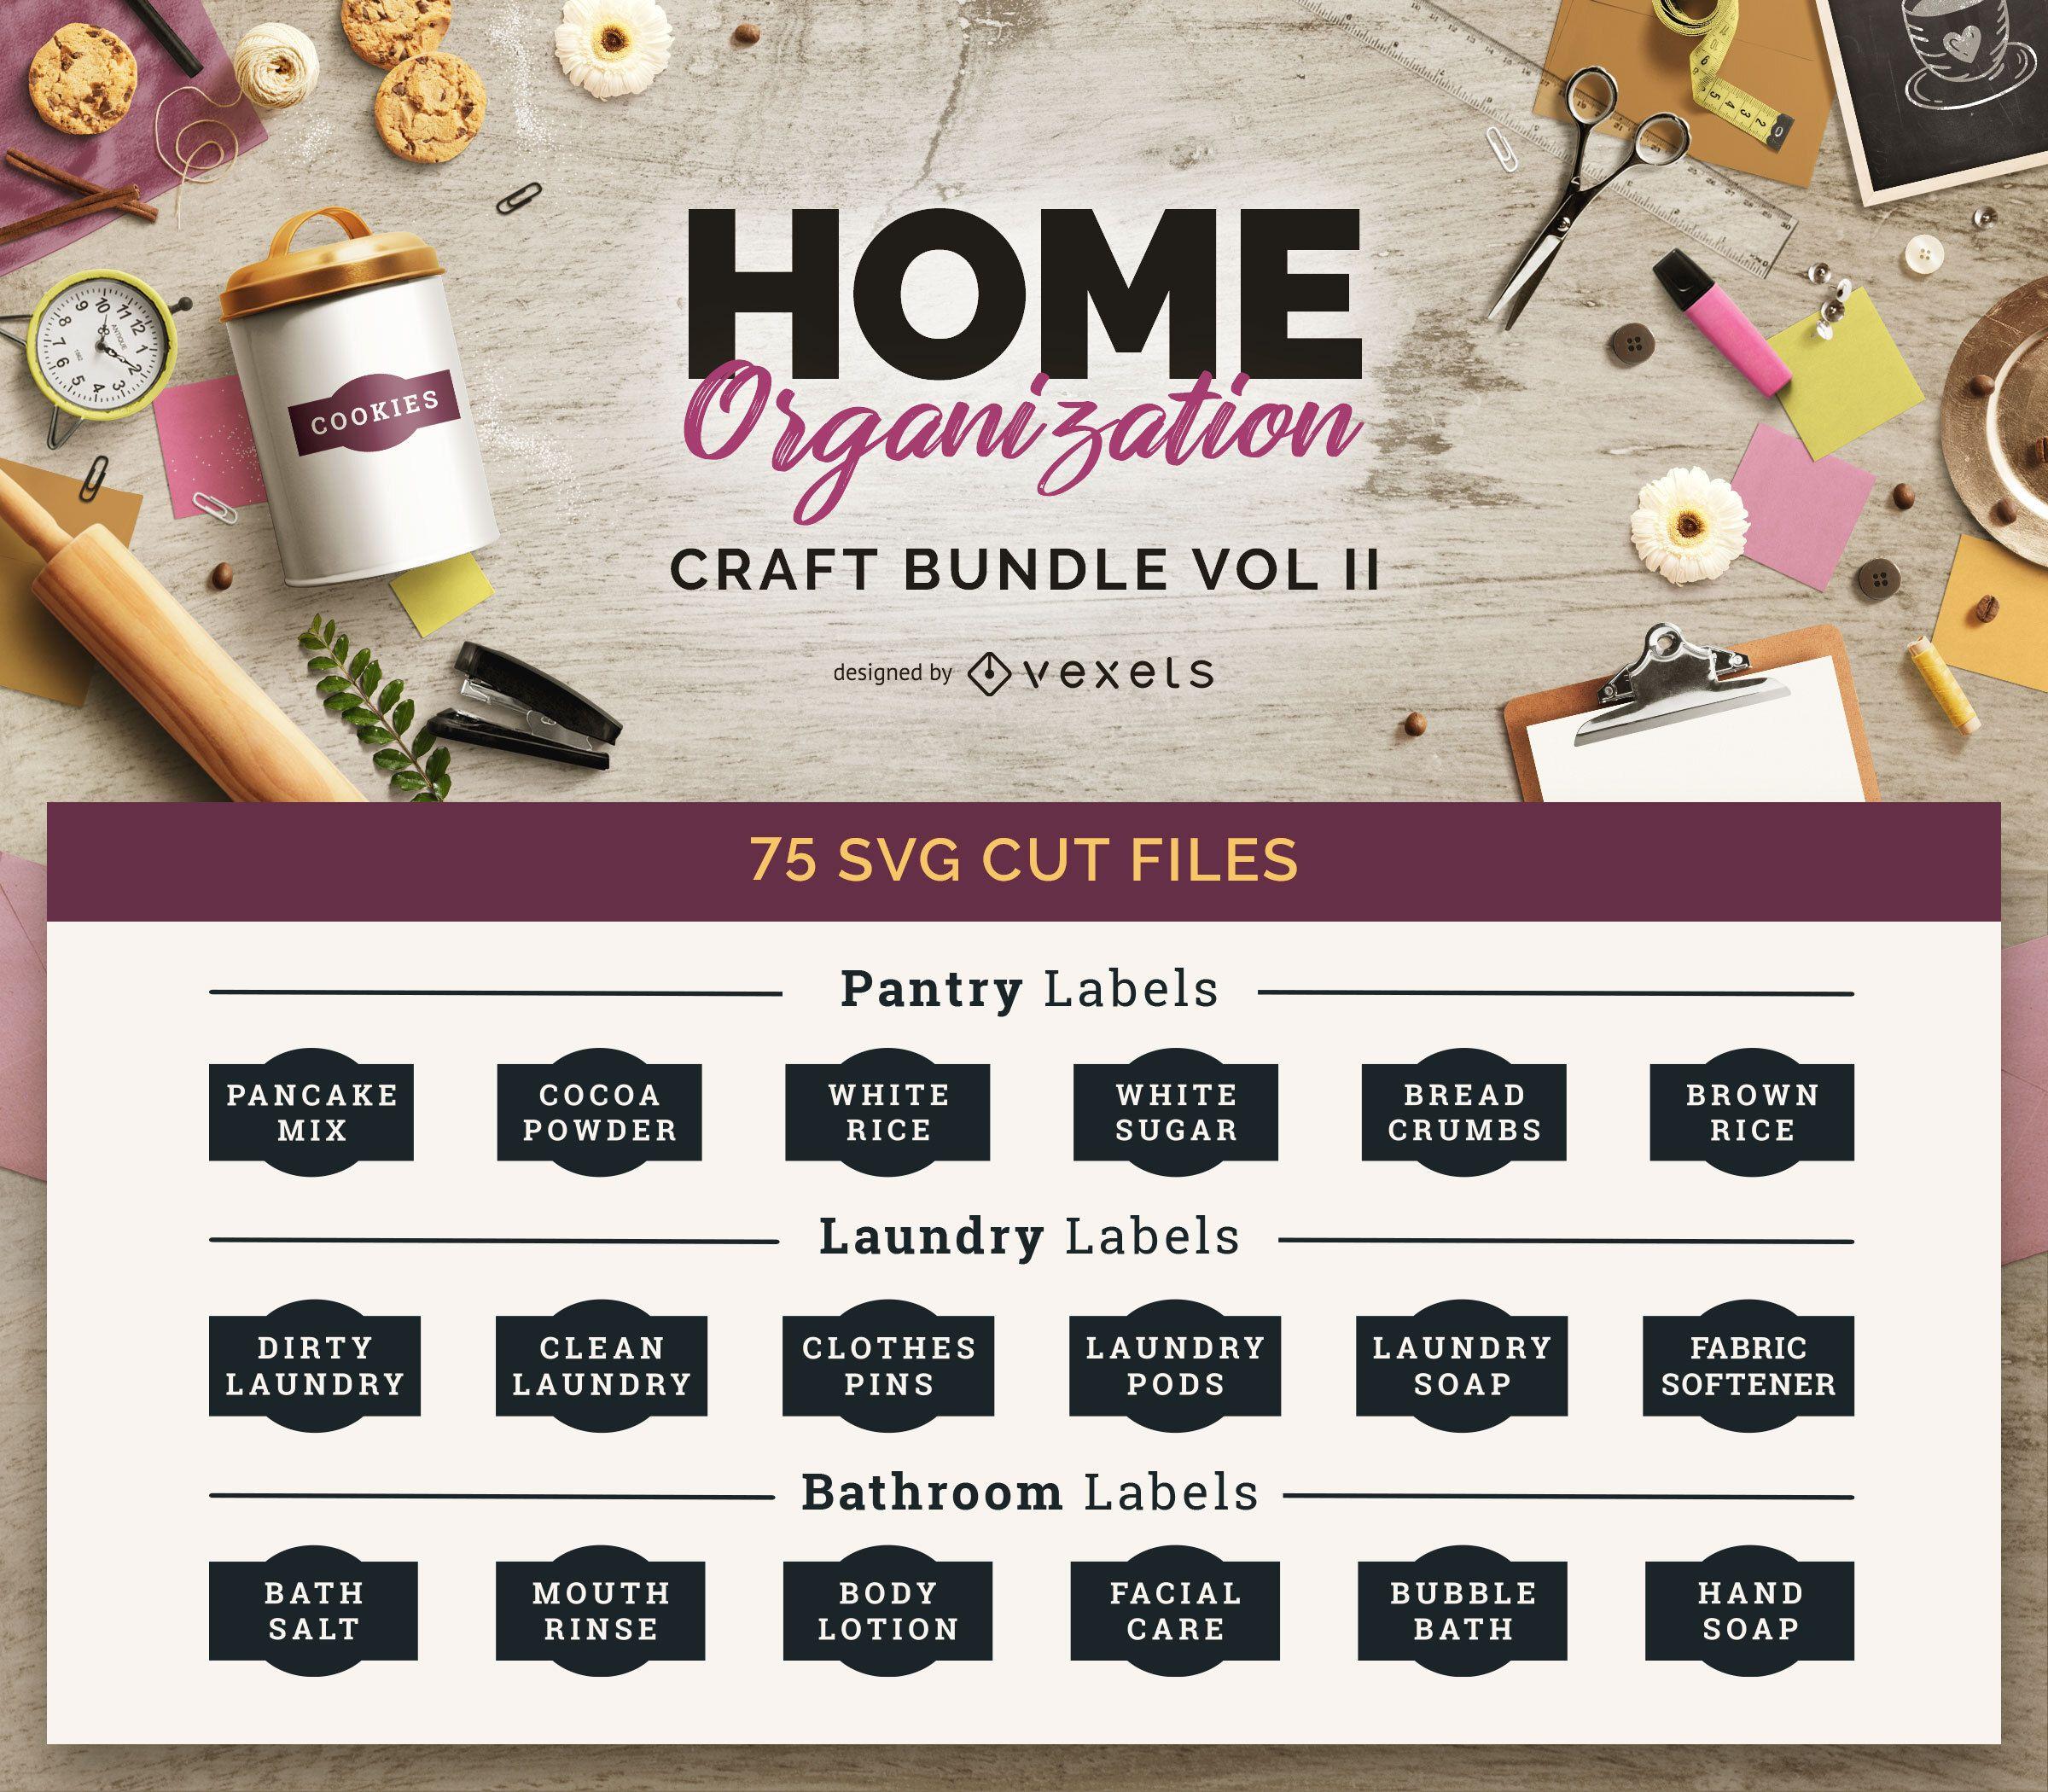 Home Organization Craft Bundle Vol II